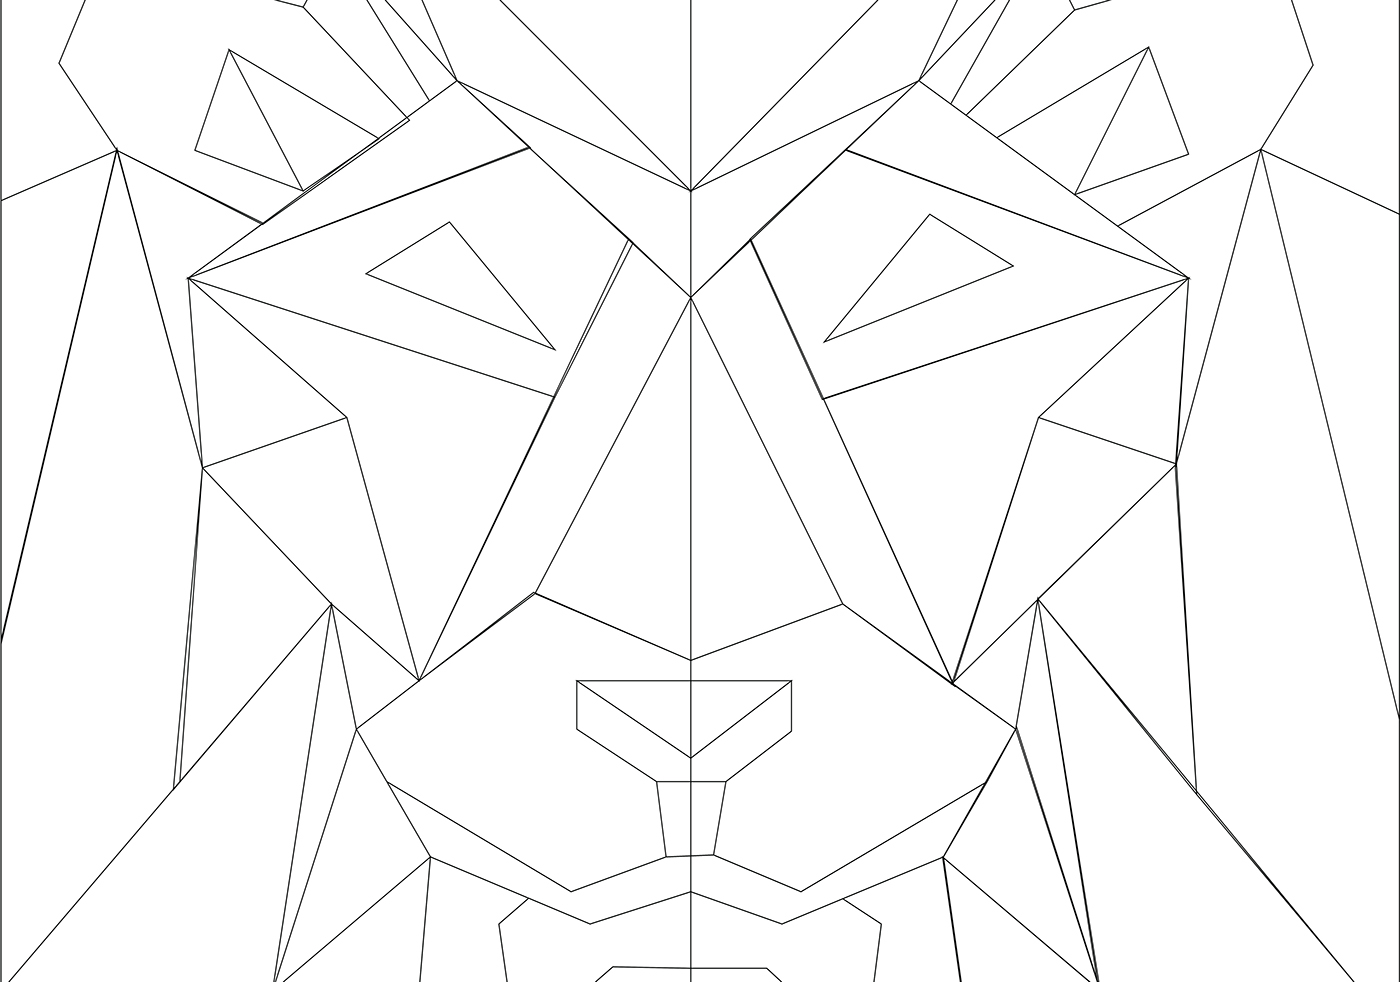 Low Poly Animals | Graphic Design, Illustration, UX Design